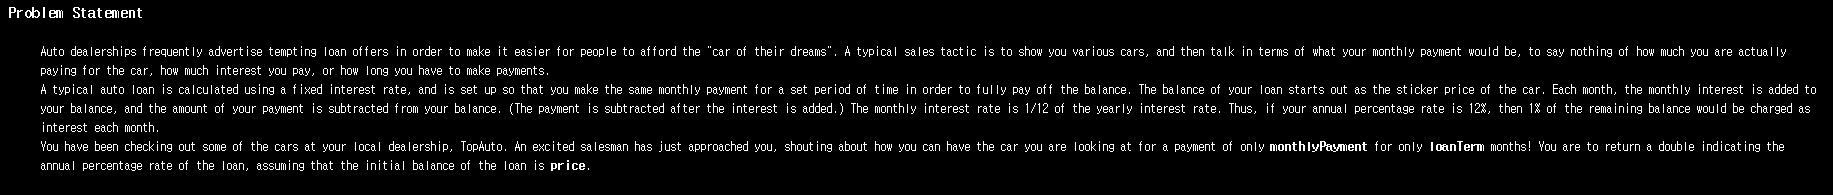 [TopCoder] 자동차 대출(AutoLoan) 분석 ..